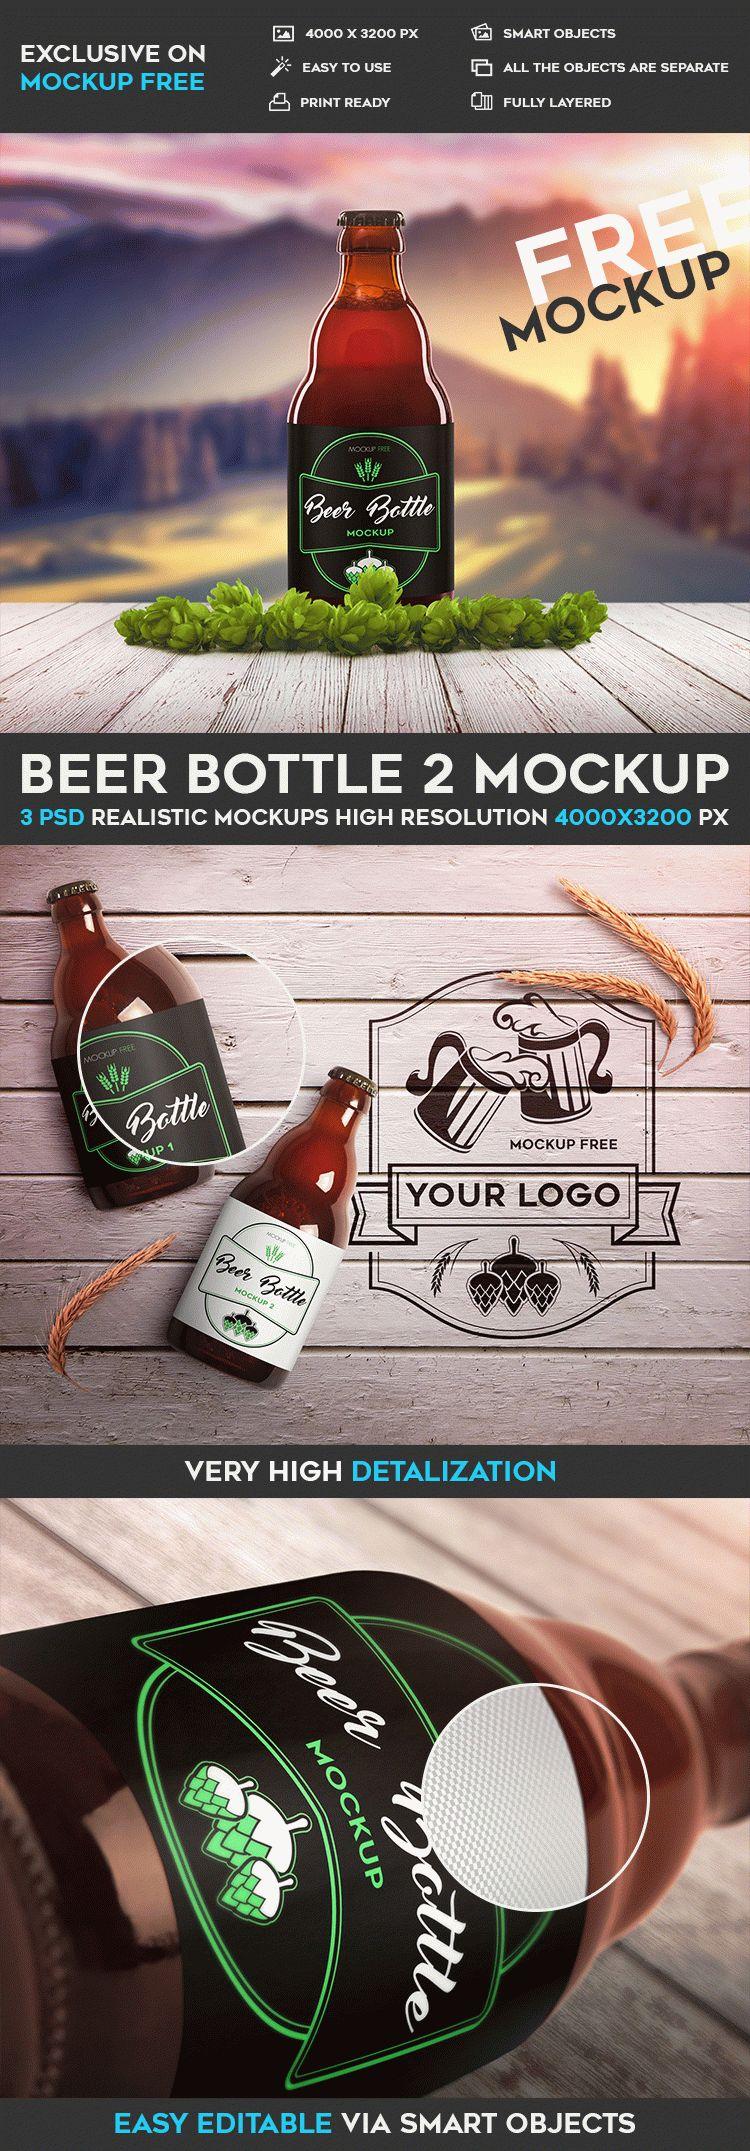 bigpreview_beer-bottle-2